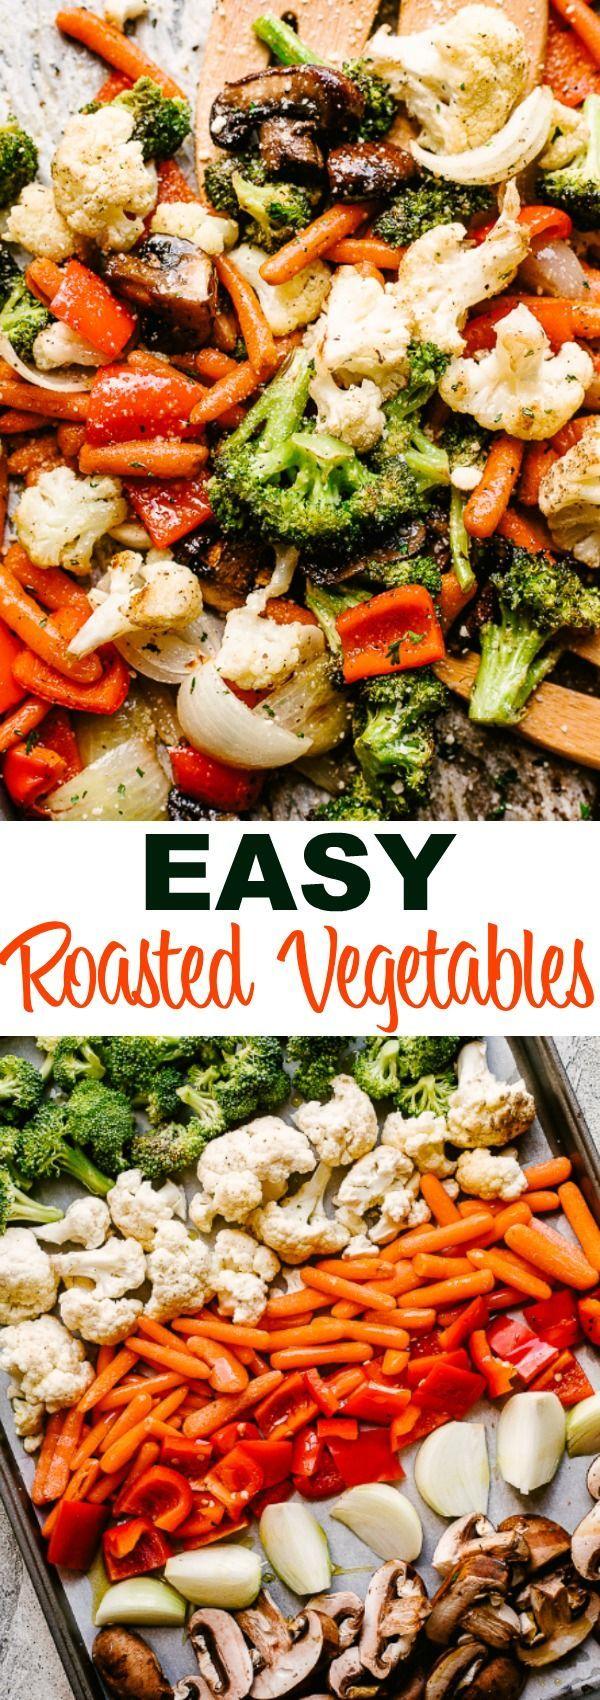 Photo of Receta de verduras asadas al horno fácil | Dietetica